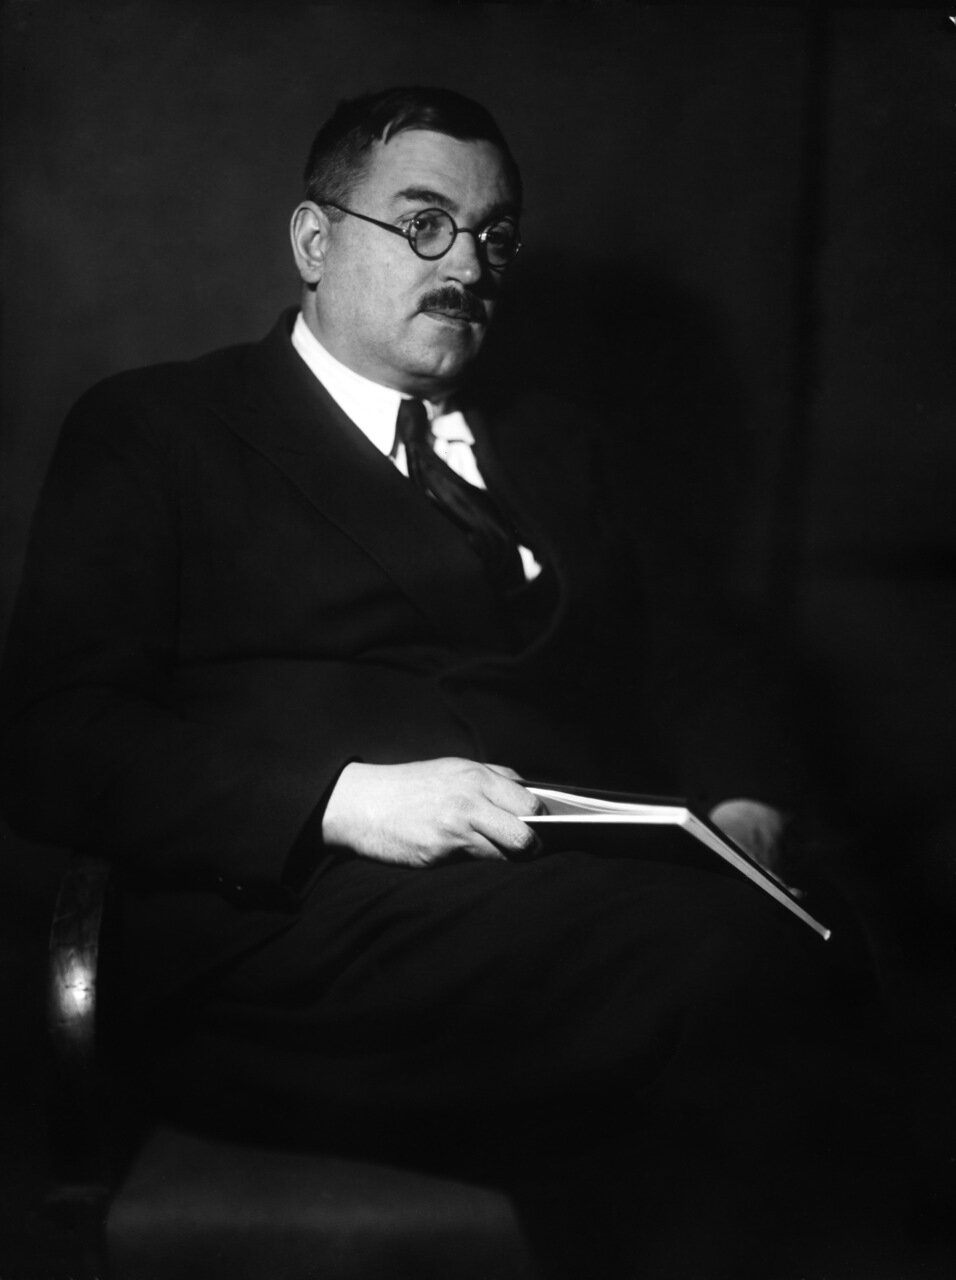 Фок Владимир Александрович (1898 — 1974) — советский физик-теоретик. Академик АН СССР (1939; член-корреспондент с 1932 года)